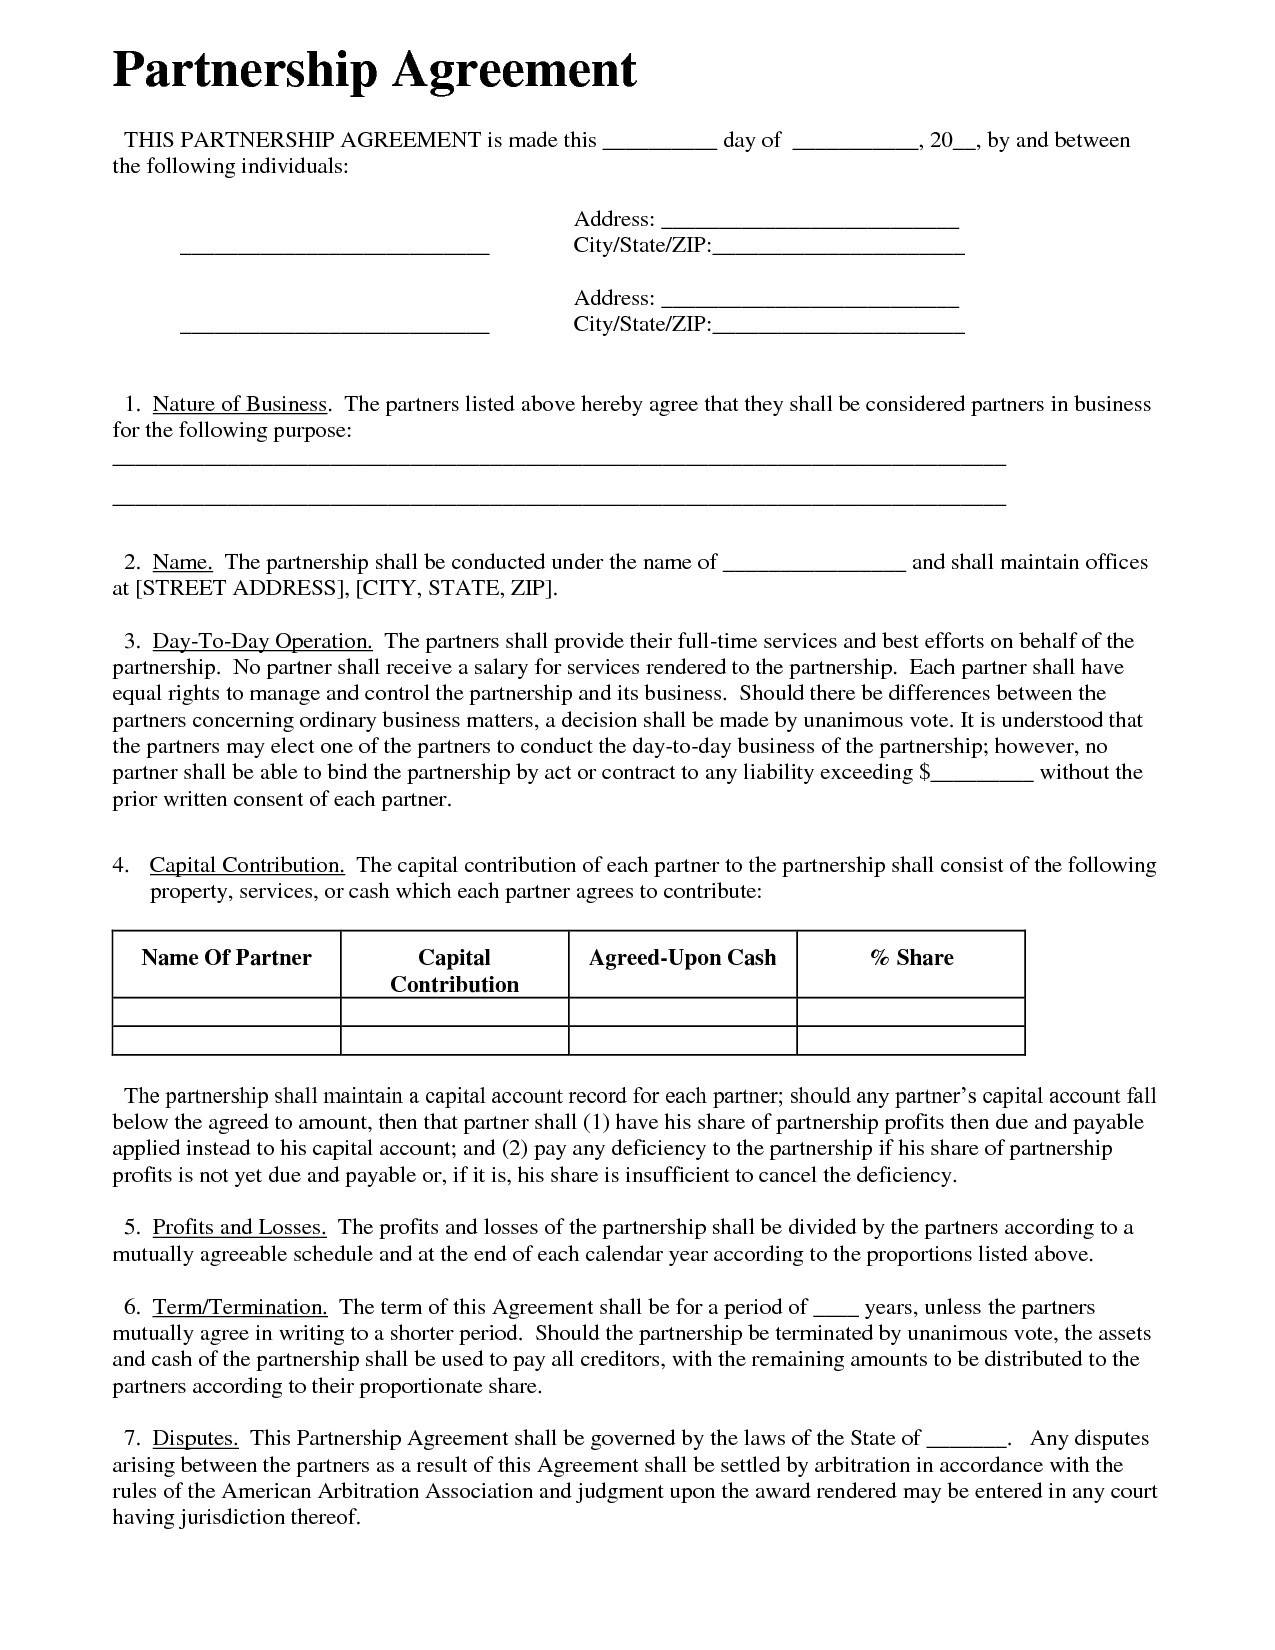 Partnership Contract Template Pdf